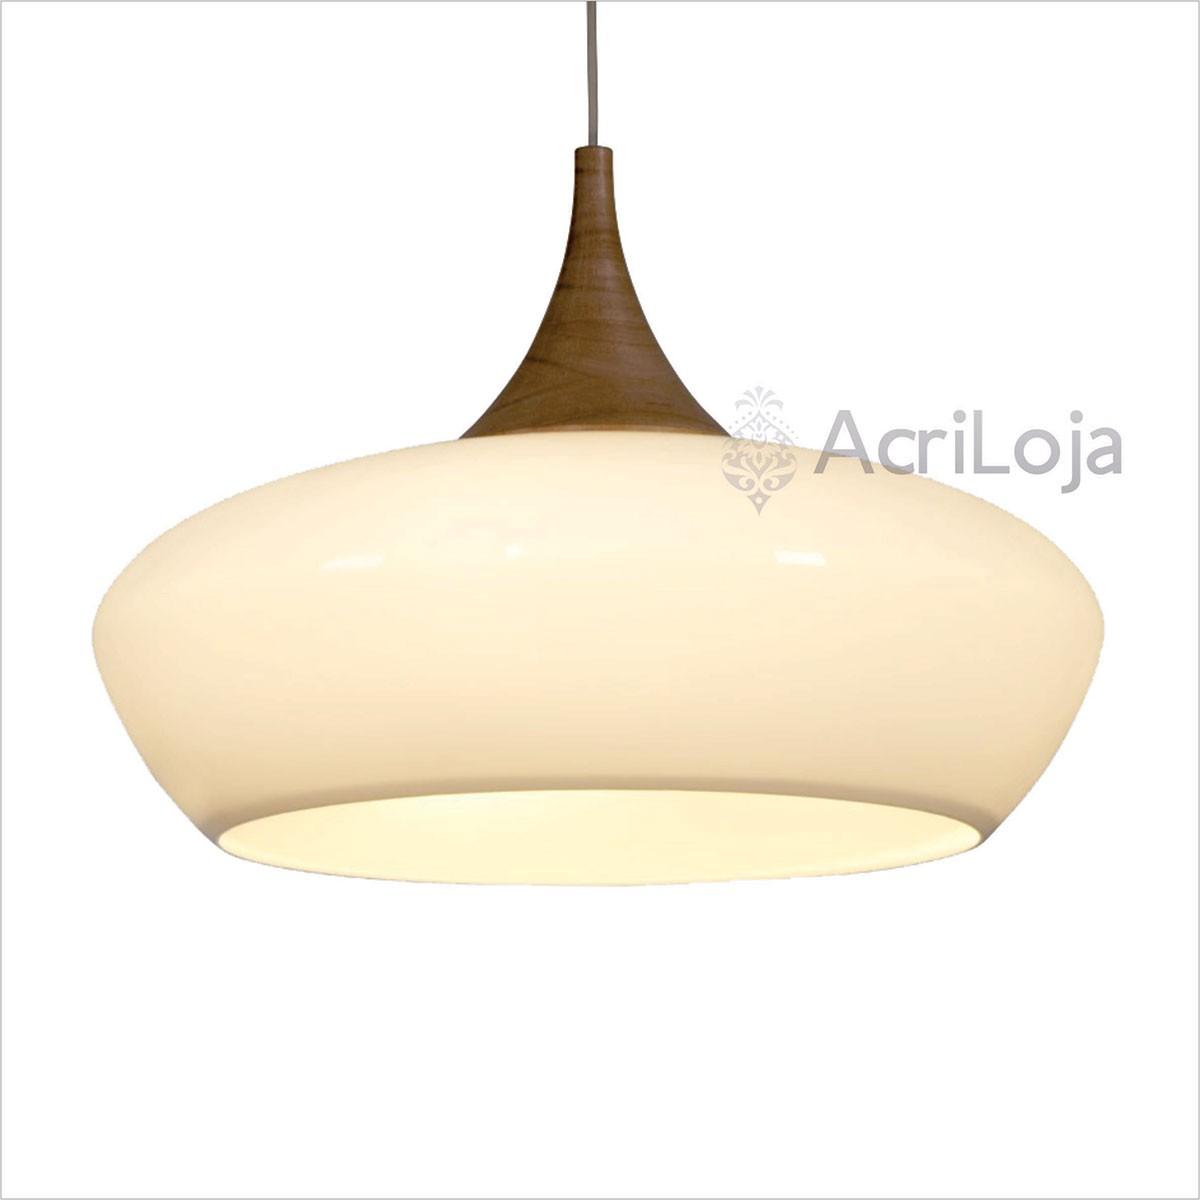 Luminaria Pendente Tune Em Acrílico Branco 80x47 4 Lâmpadas, Lustre de teto